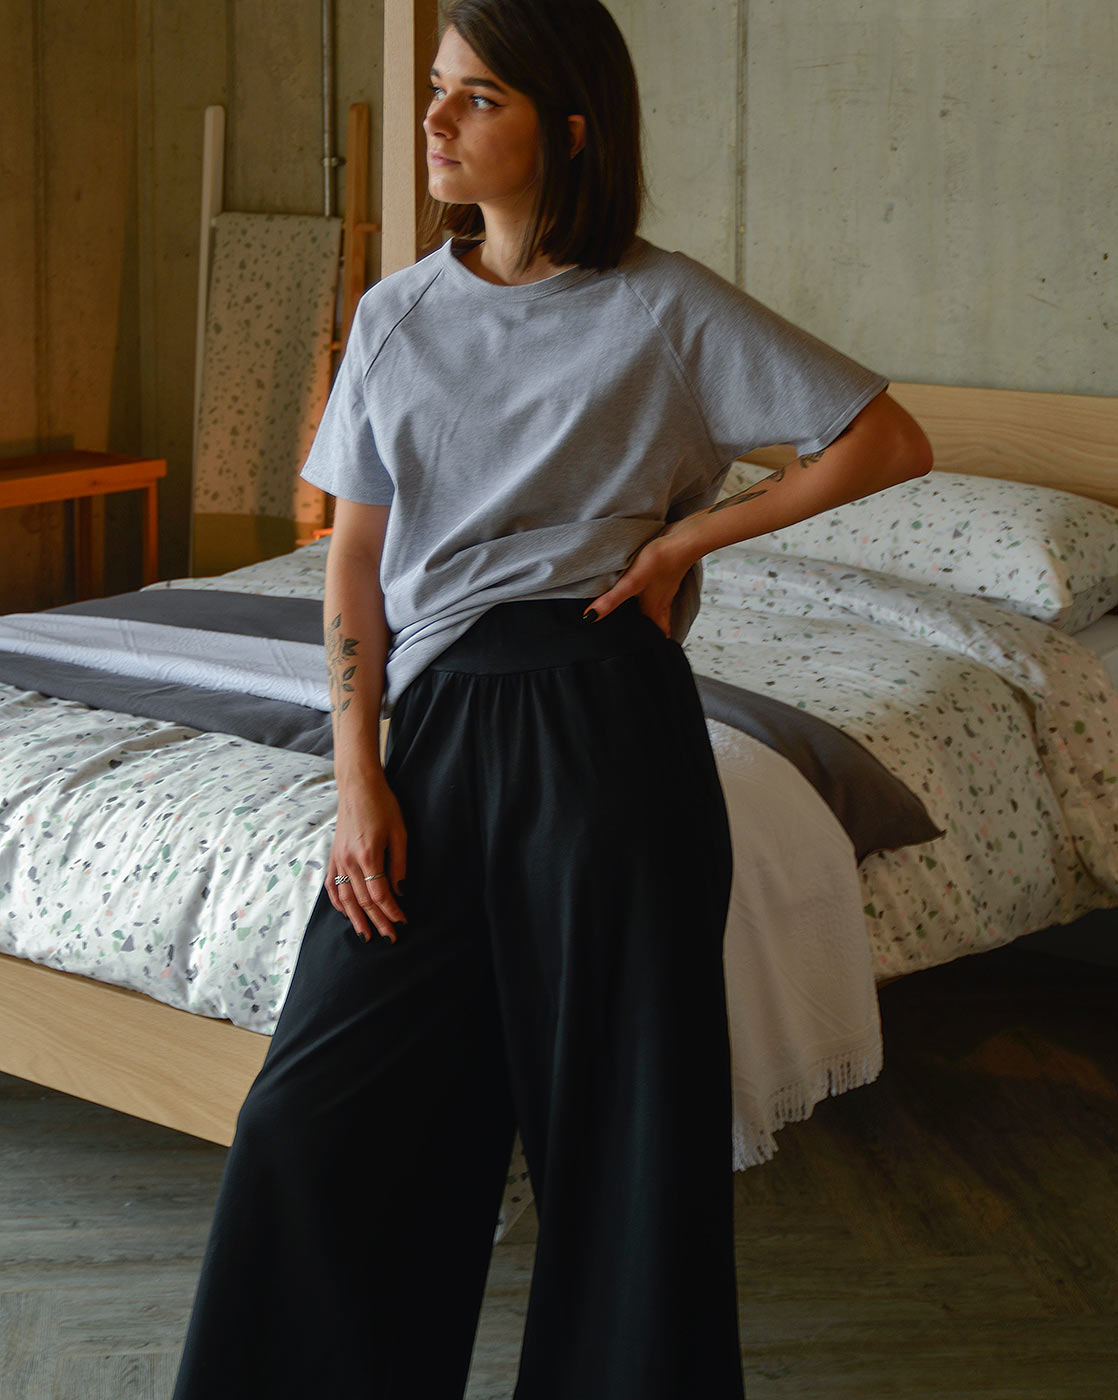 grey-marl-t-shirt-and-black-wide-leg-pants